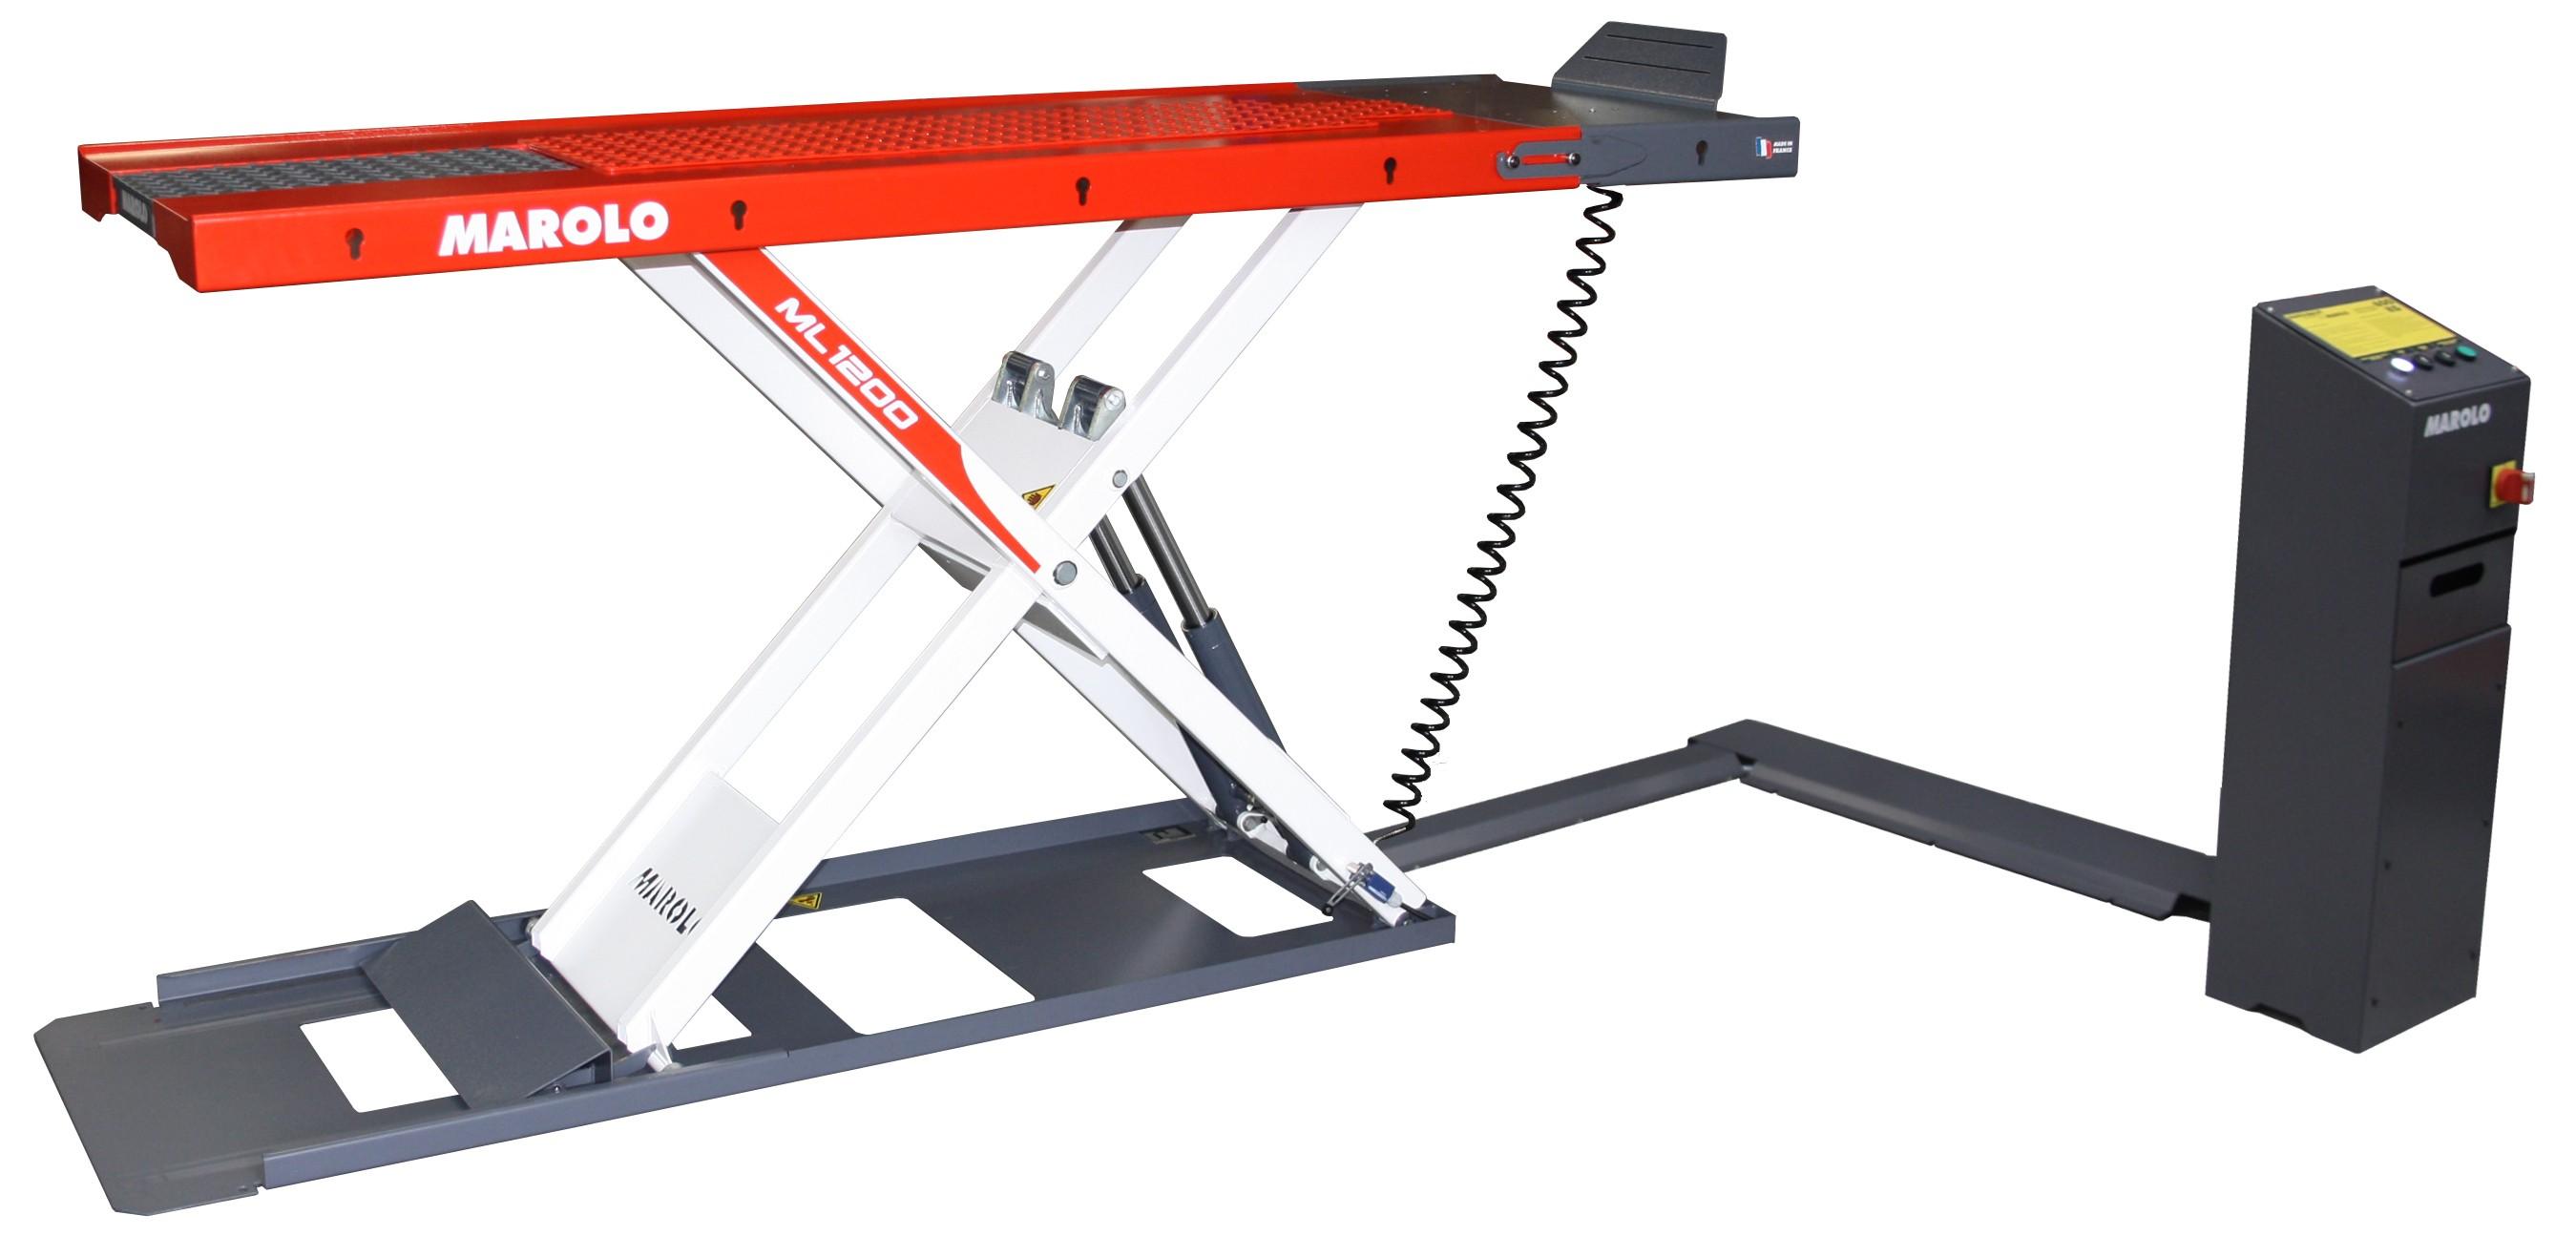 Marolotest lift extra flat marolowlift 1200 w electro for Table elevatrice